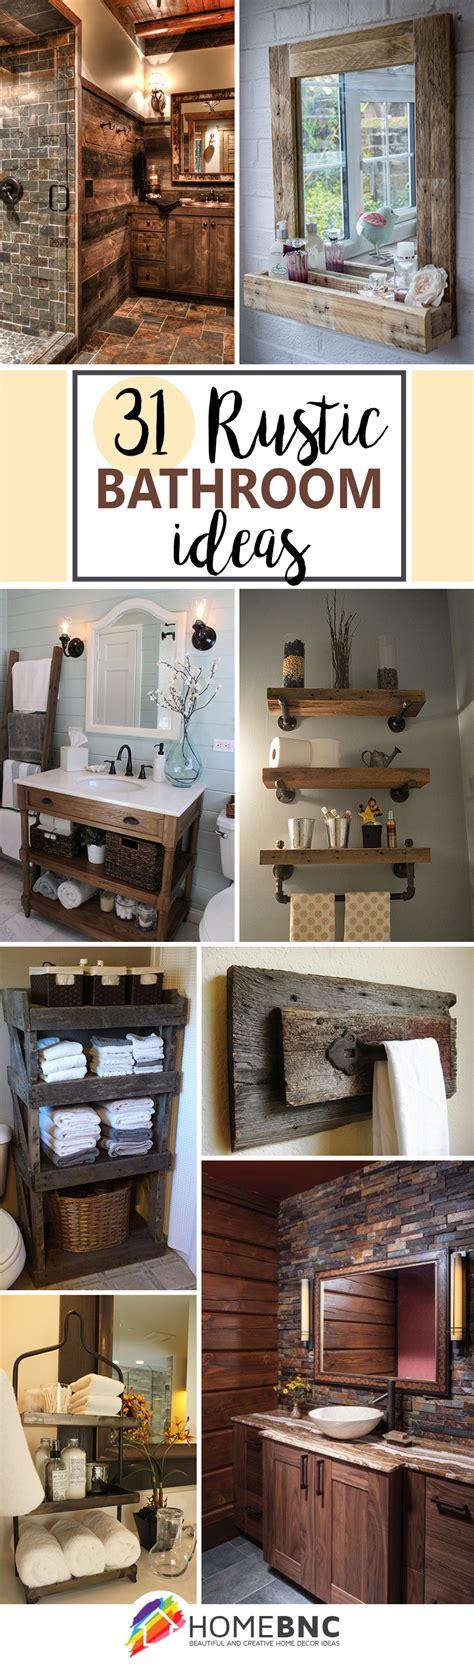 rustic decor ideas 31 best rustic bathroom design and decor ideas for 2016